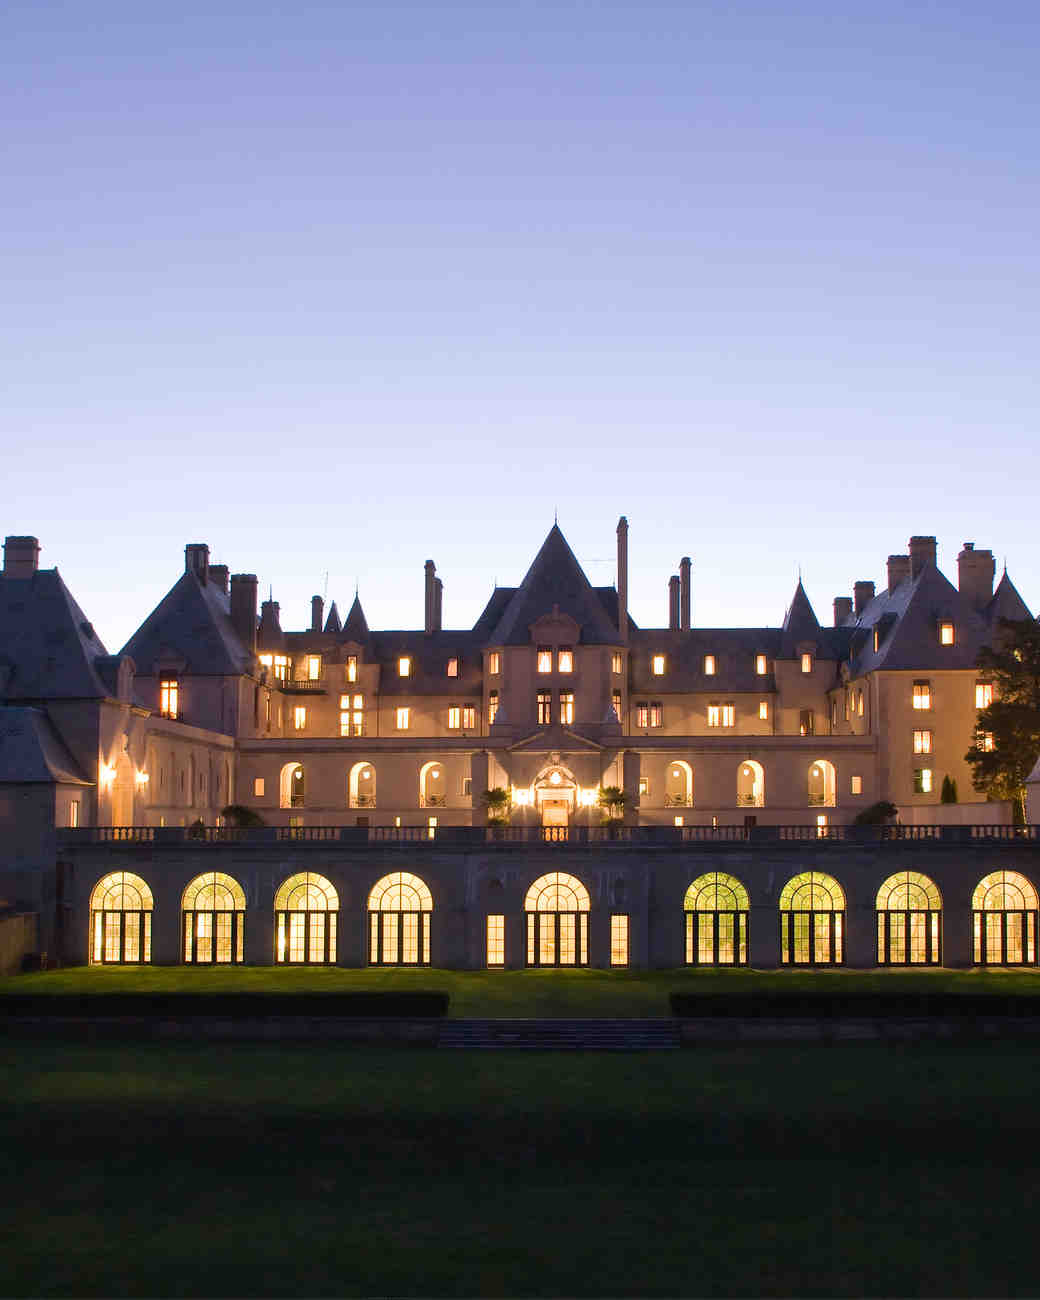 filming-locations-wedding-venues-oheka-castle-citizen-kane-0215.jpg